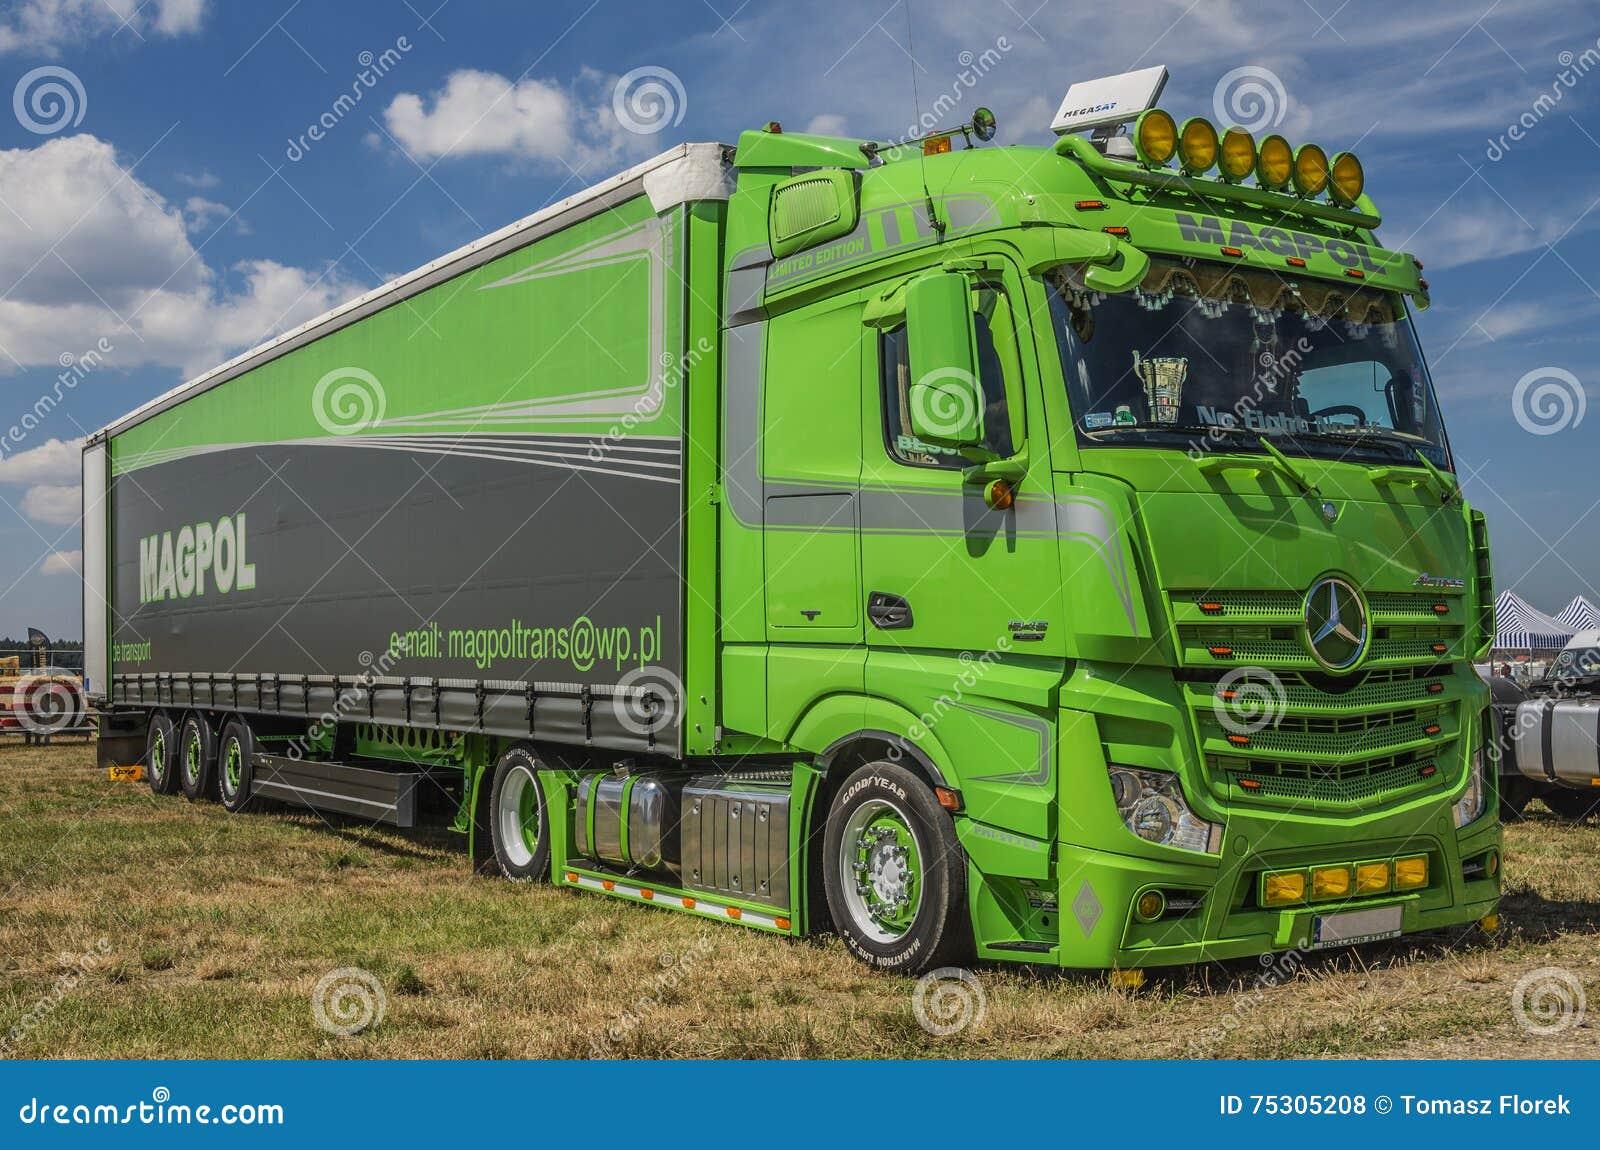 camion mercedes benz actros 1845 fotografia stock editoriale immagine di verde evento 75305208. Black Bedroom Furniture Sets. Home Design Ideas